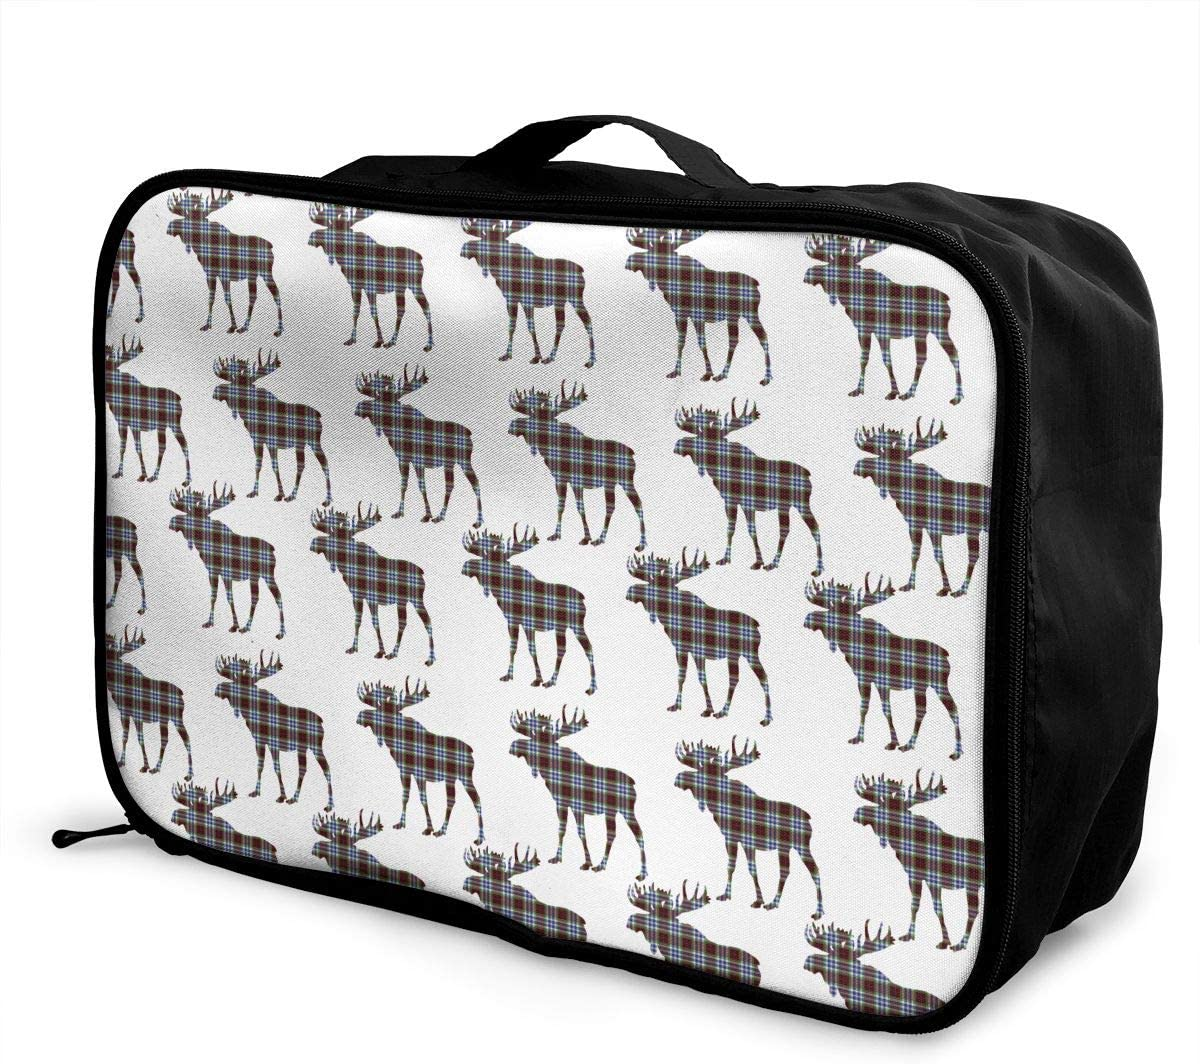 Travel Luggage Duffle Bag Lightweight Portable Handbag Cartoon Mountain Print Large Capacity Waterproof Foldable Storage Tote